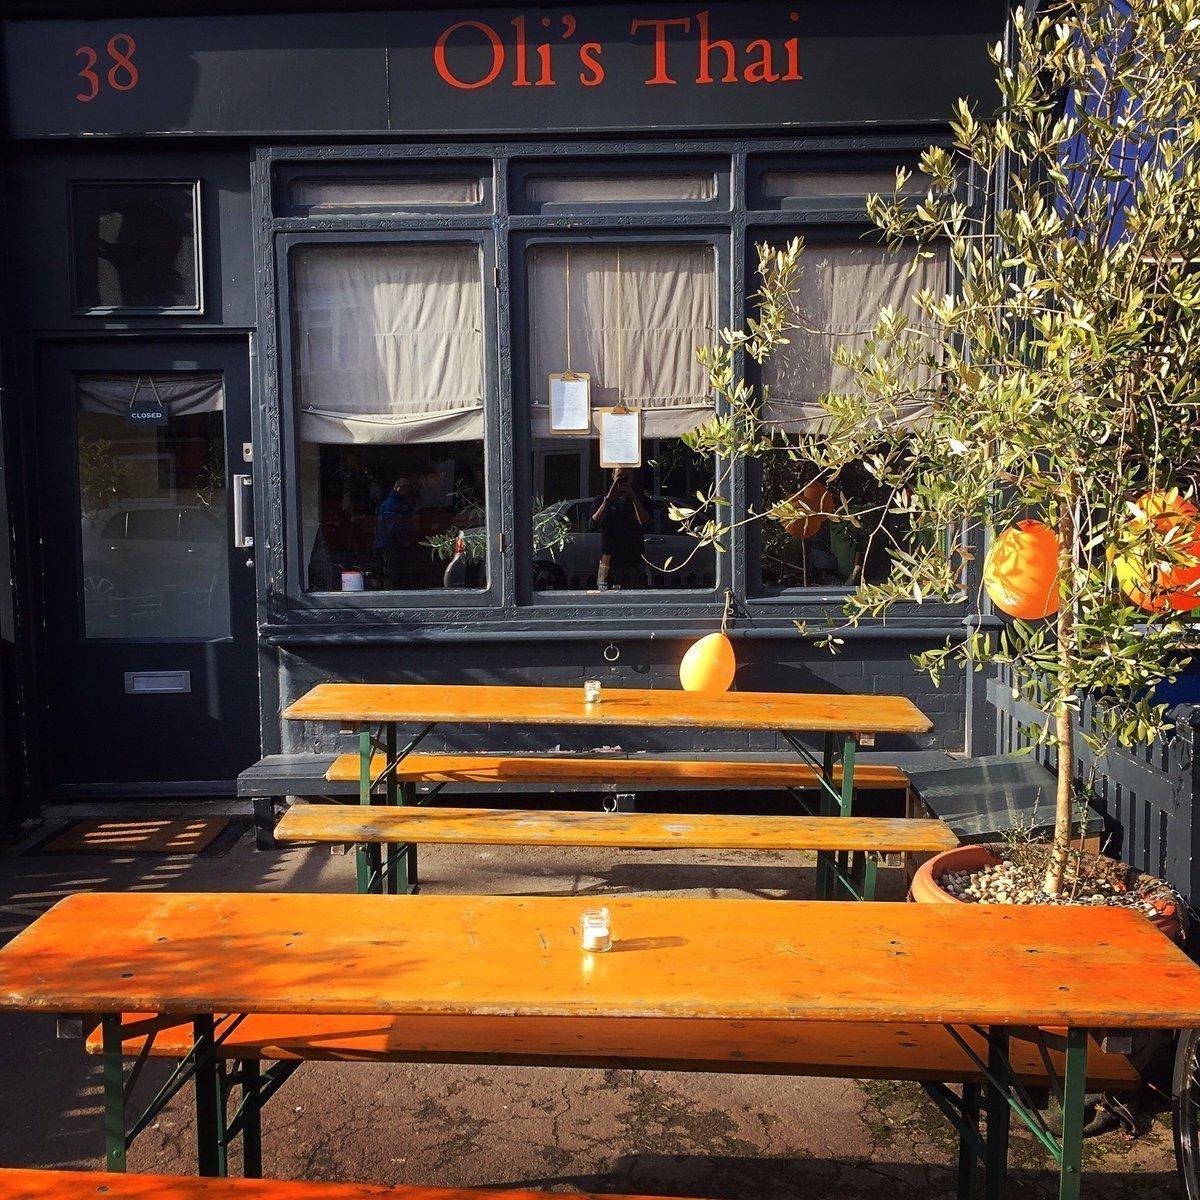 Oli's Thai Restaurant, Magdalen Road, Oxford - Exterior